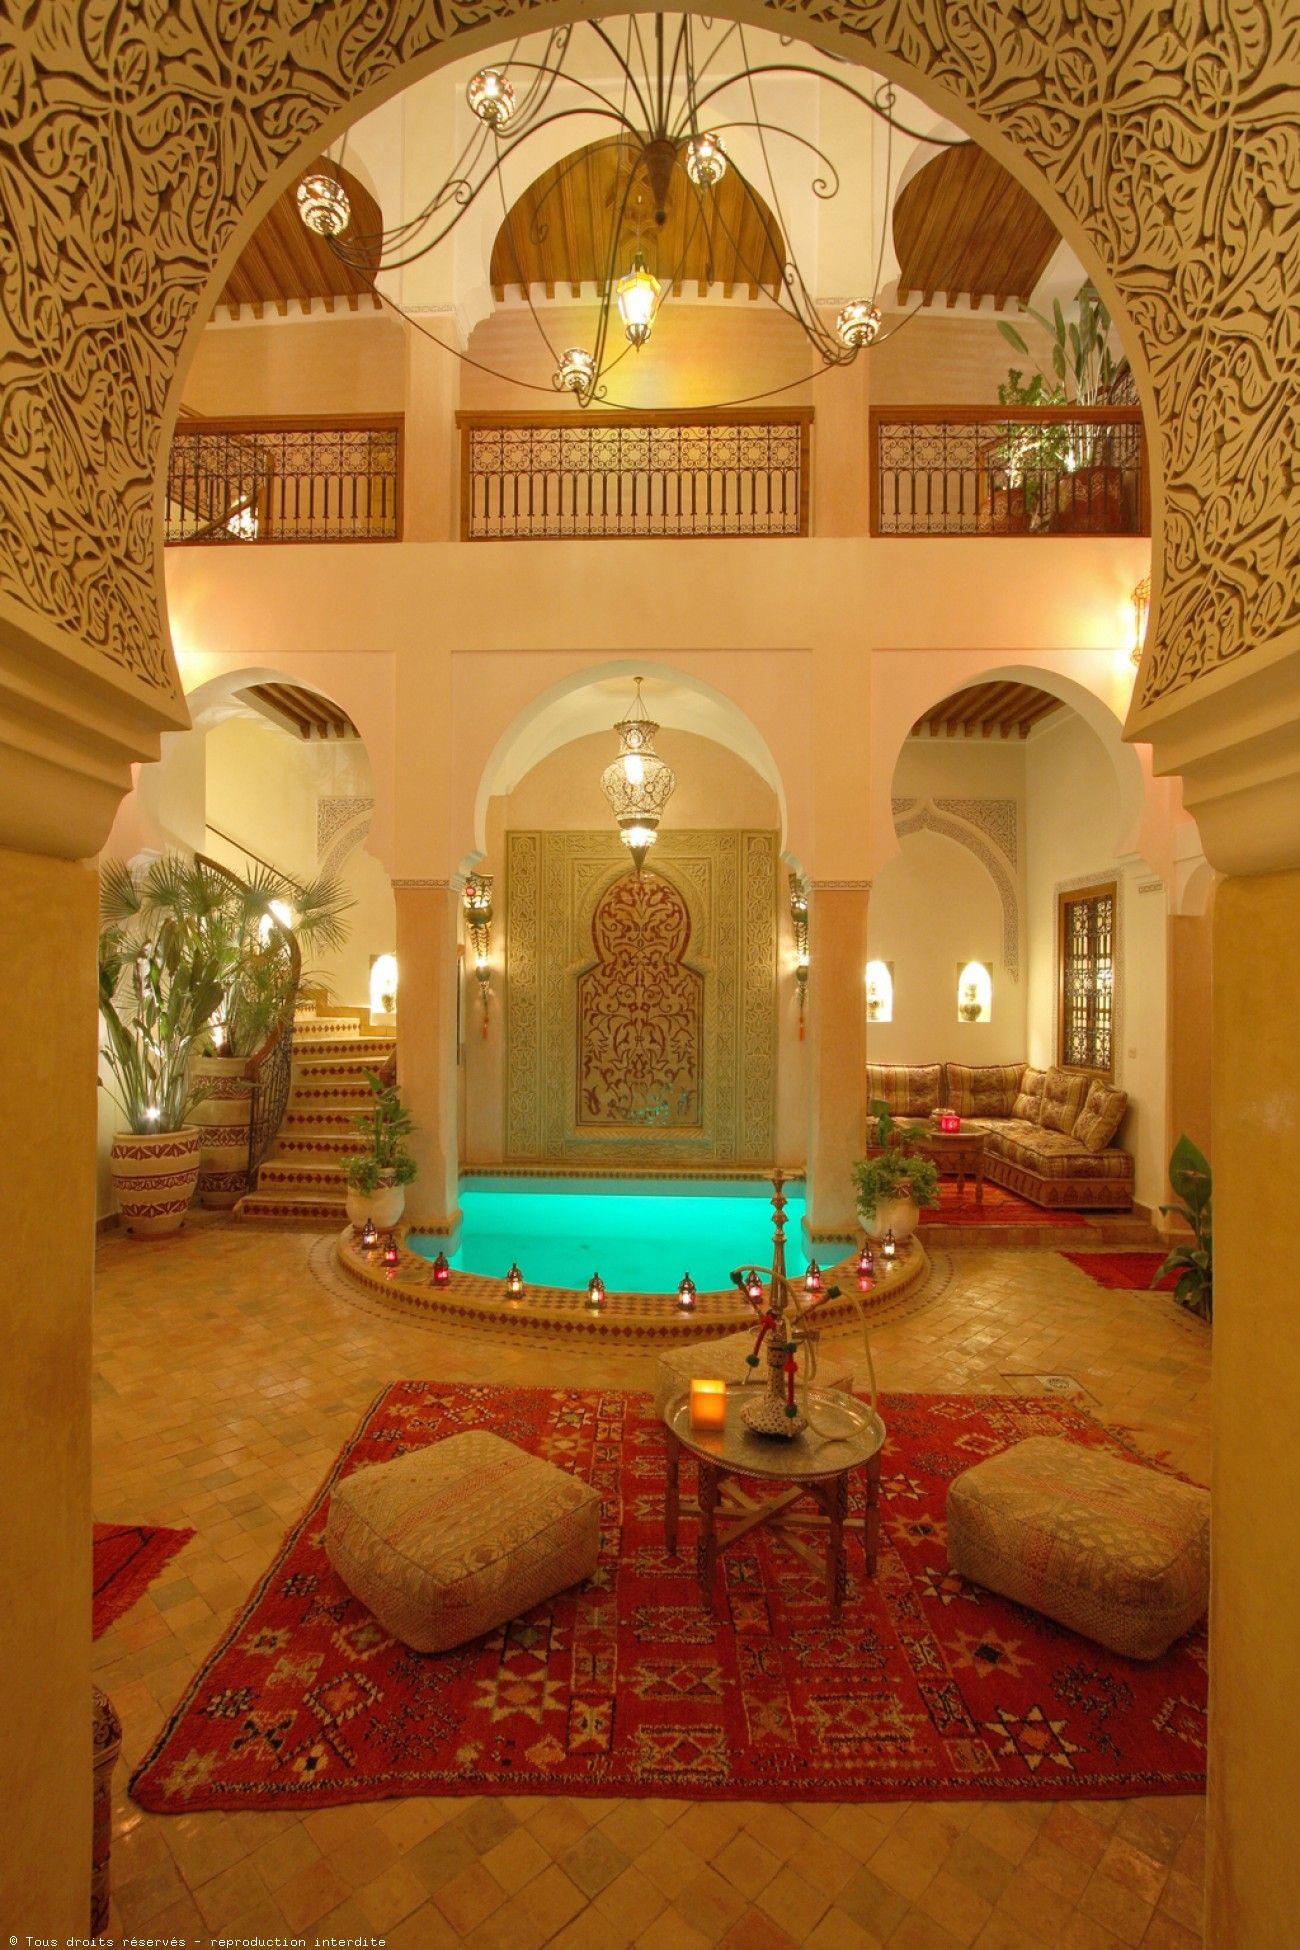 Emmy De * Medina De Marrakech Riad Avec Piscine Chauffée Et ... intérieur Riad Marrakech Avec Piscine